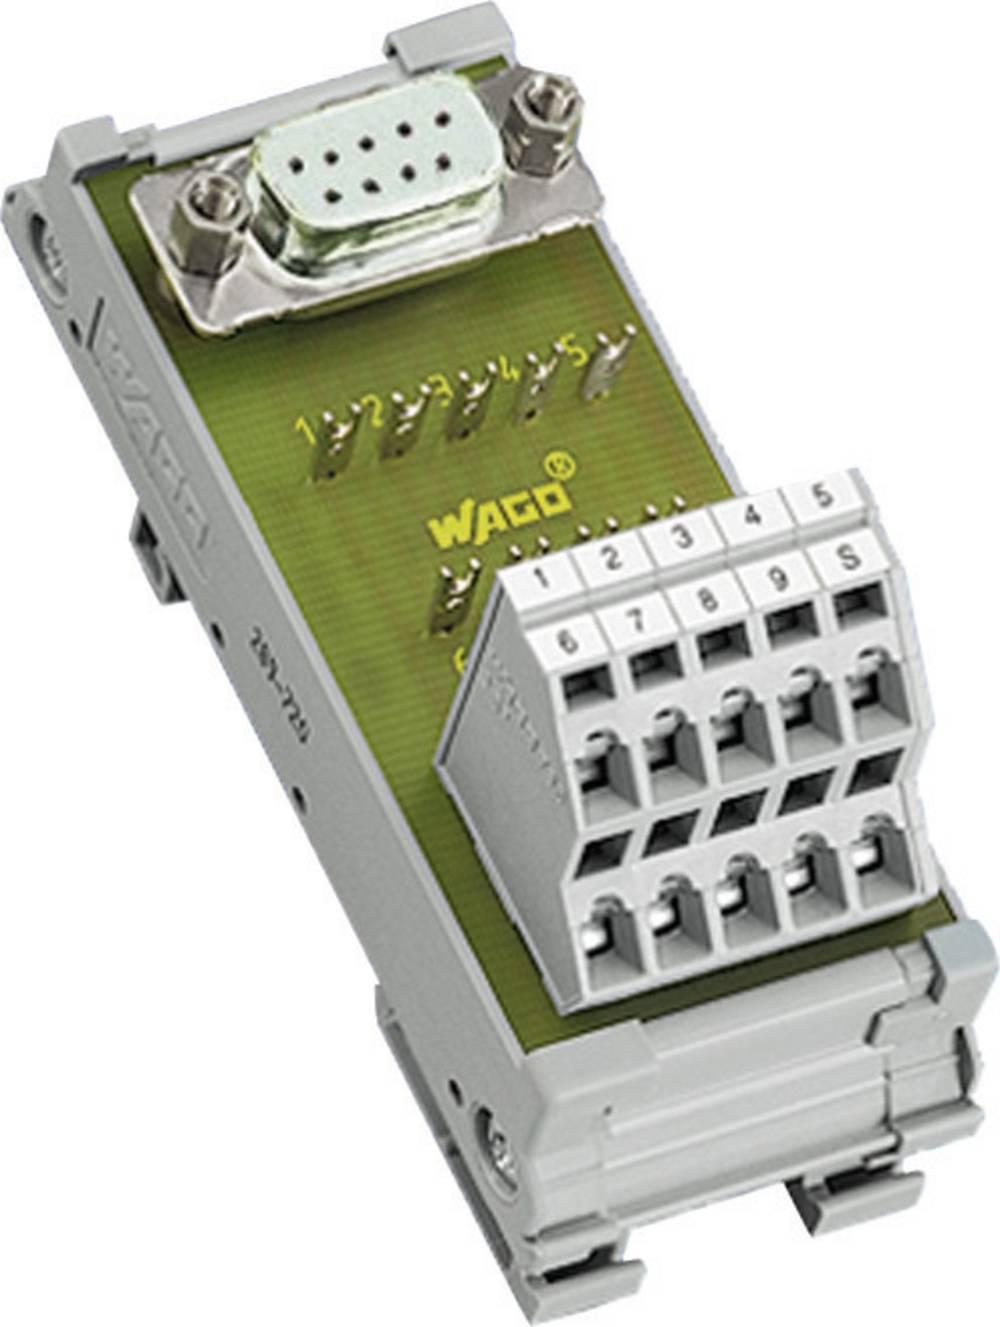 Adapterski modul D-SUB 0289-0725 WAGO 289-725